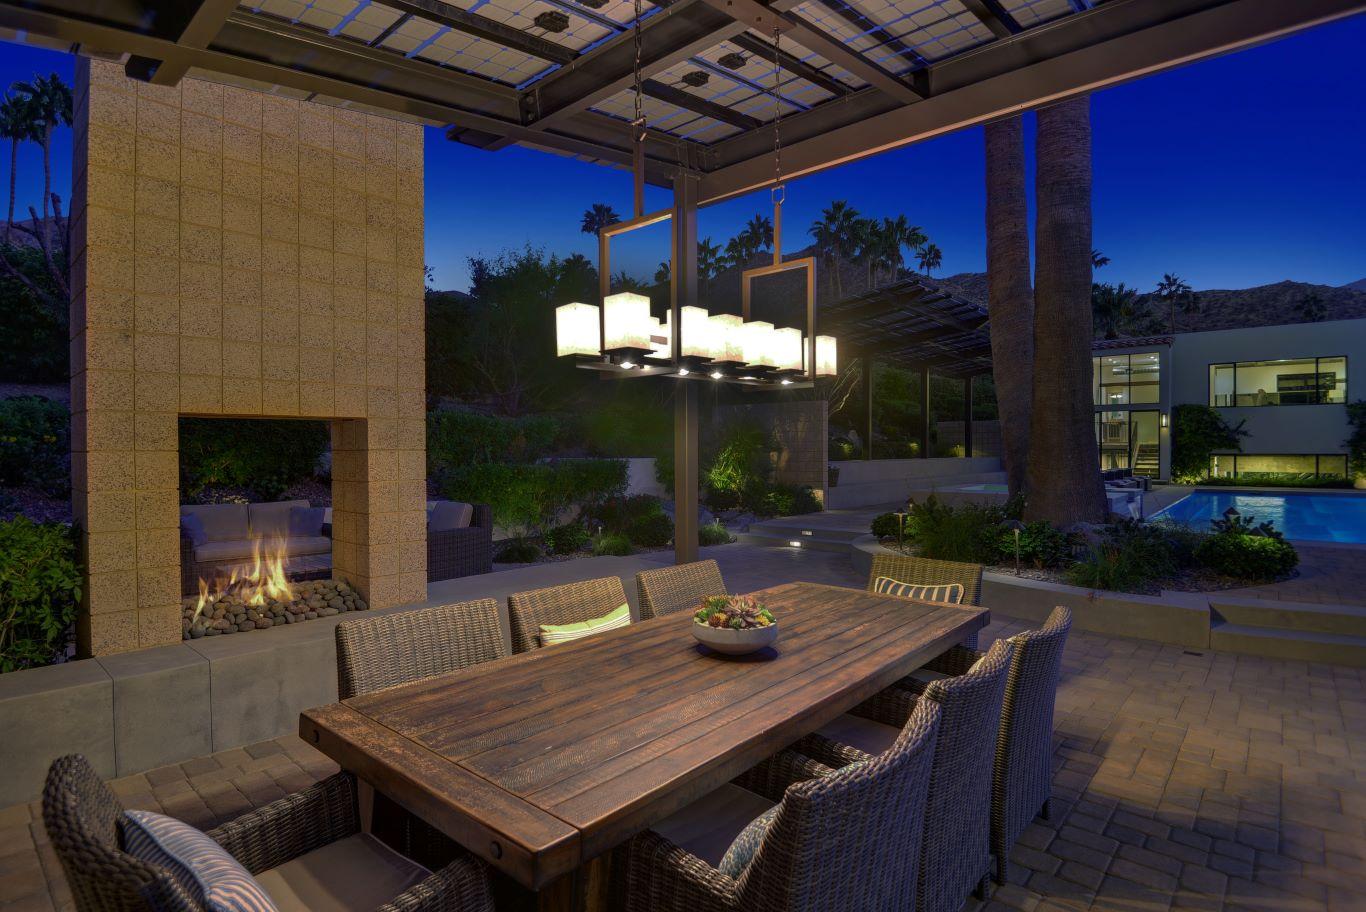 Patio Table - Night View